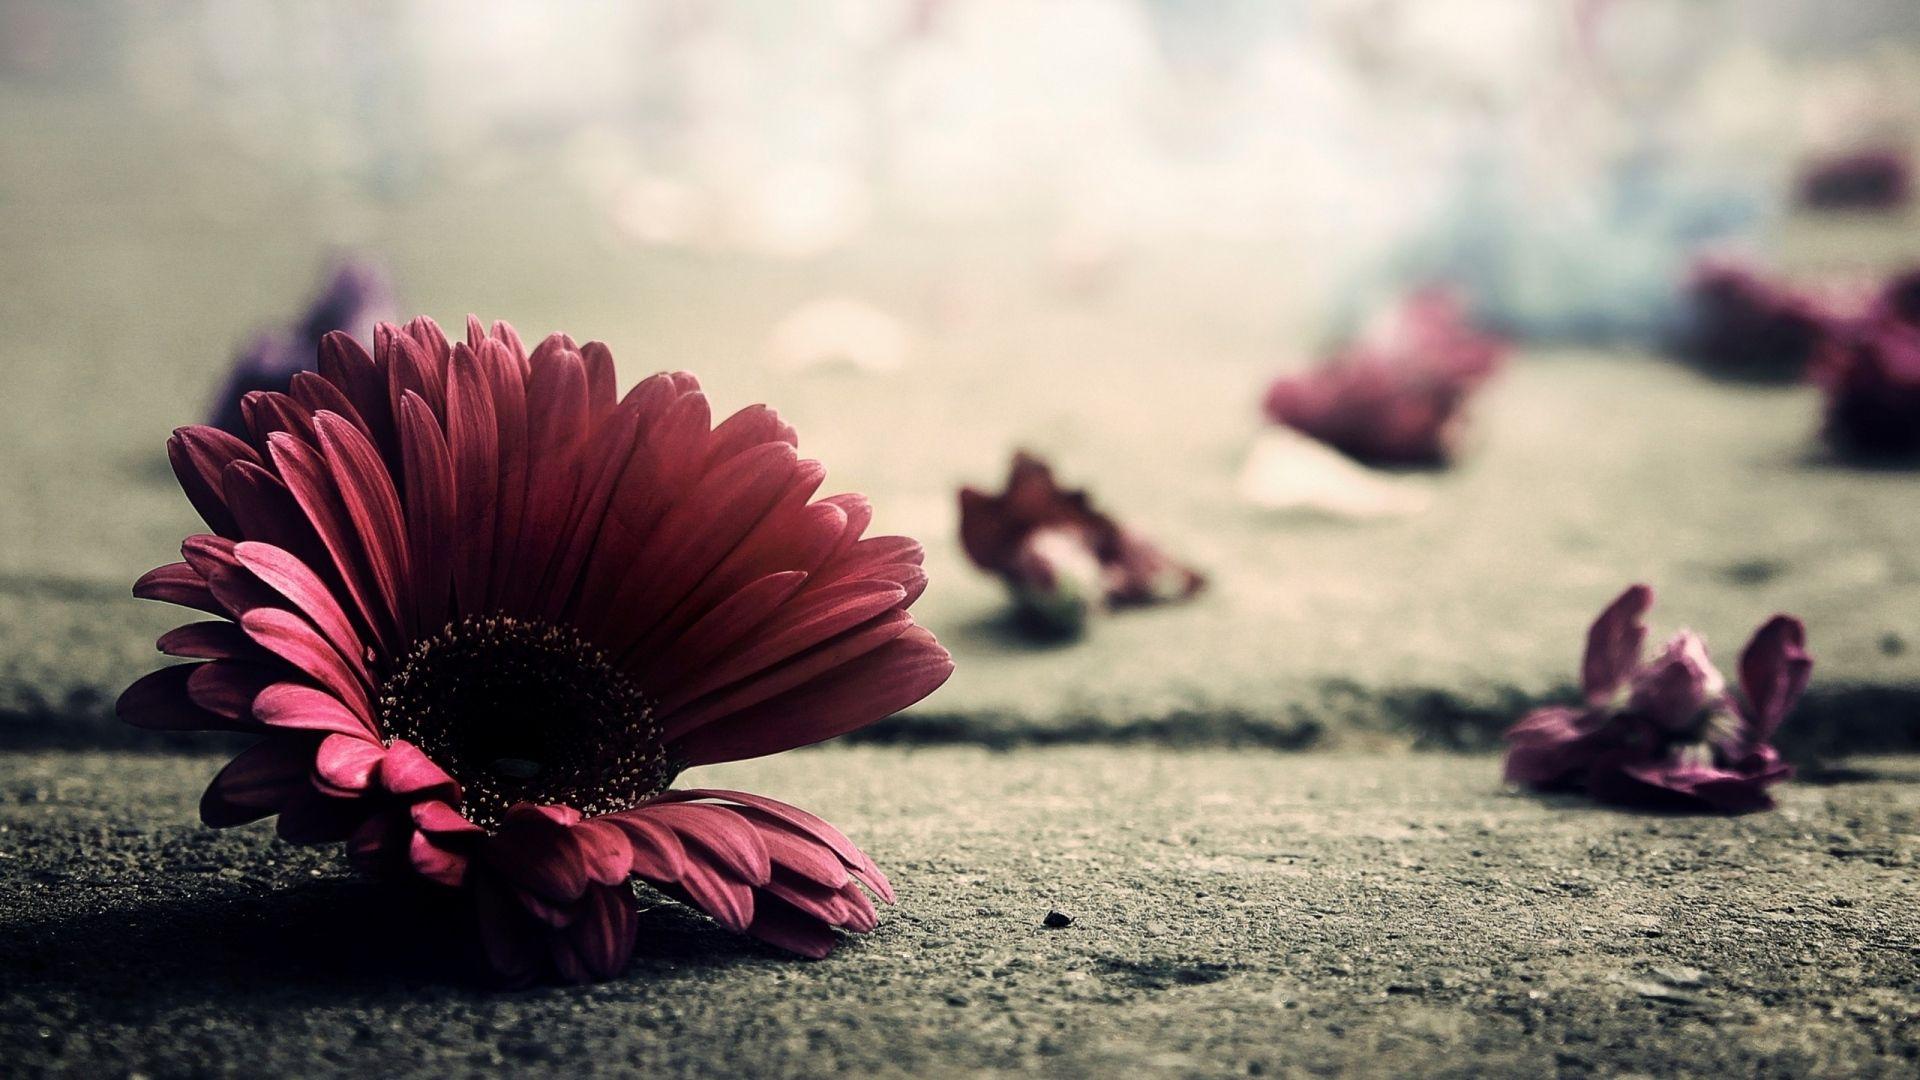 flower, petals, fragile - http://www.wallpapers4u.org/flower-petals-fragile/